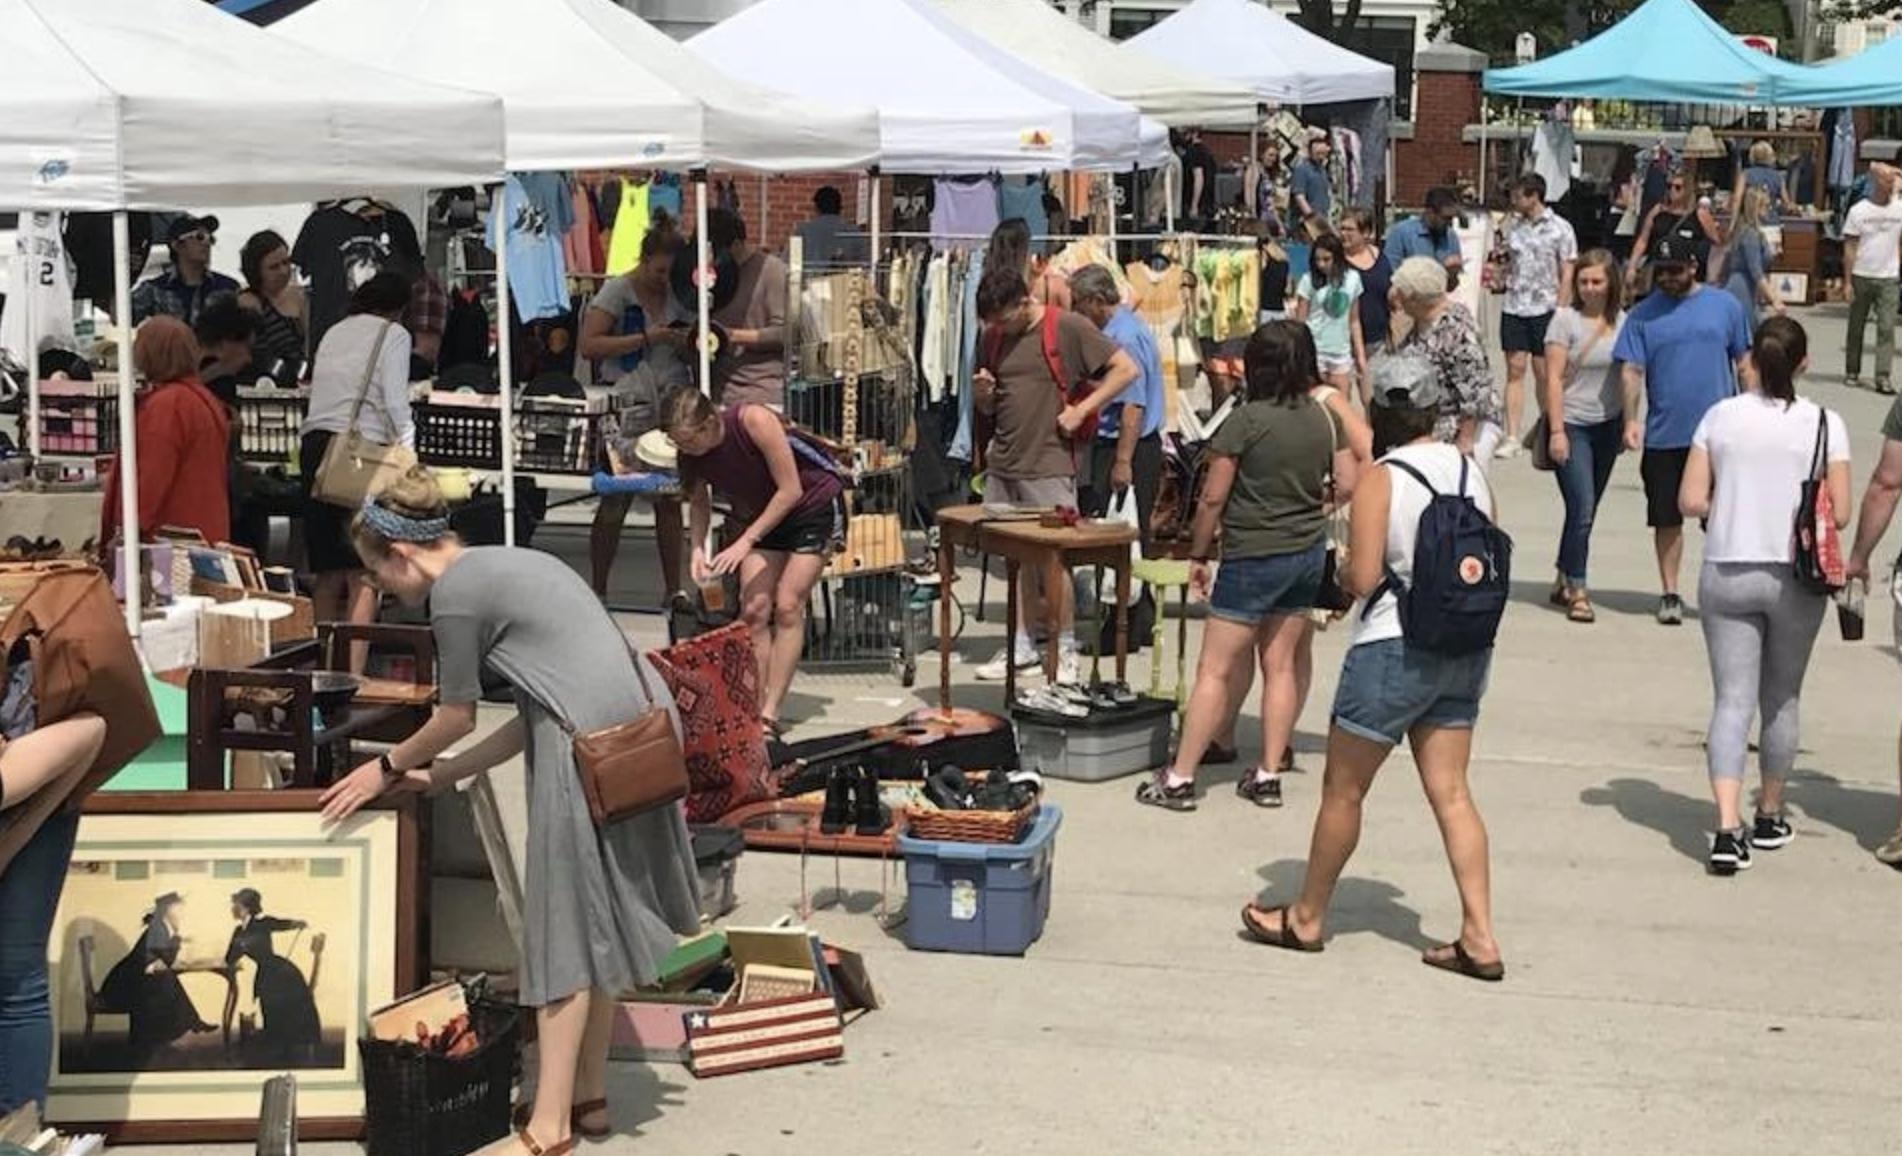 Somerville Flea Market